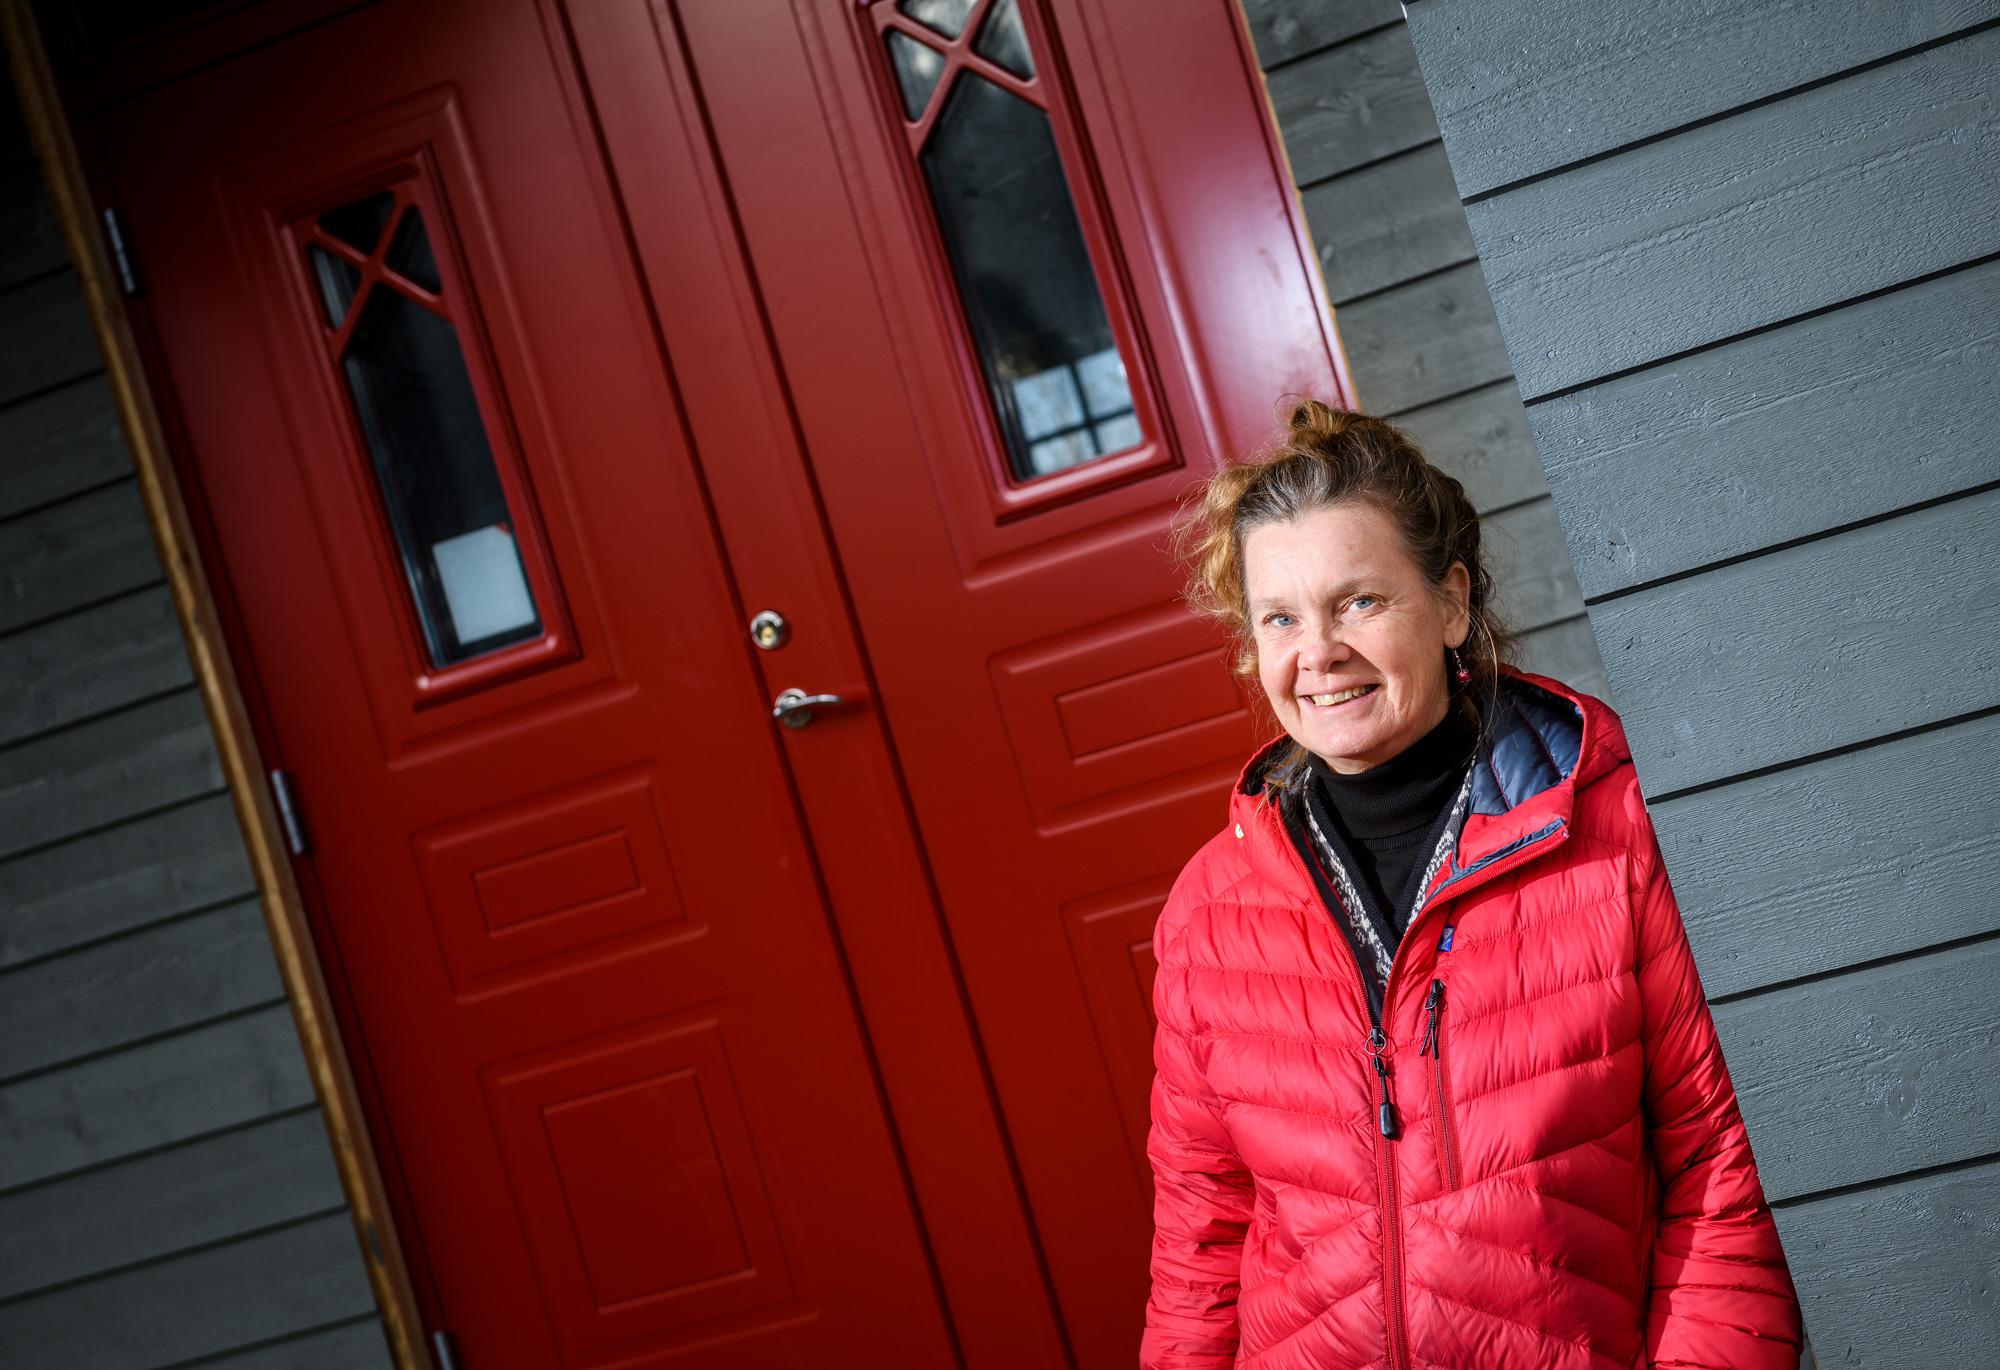 Helen framför röd dörr